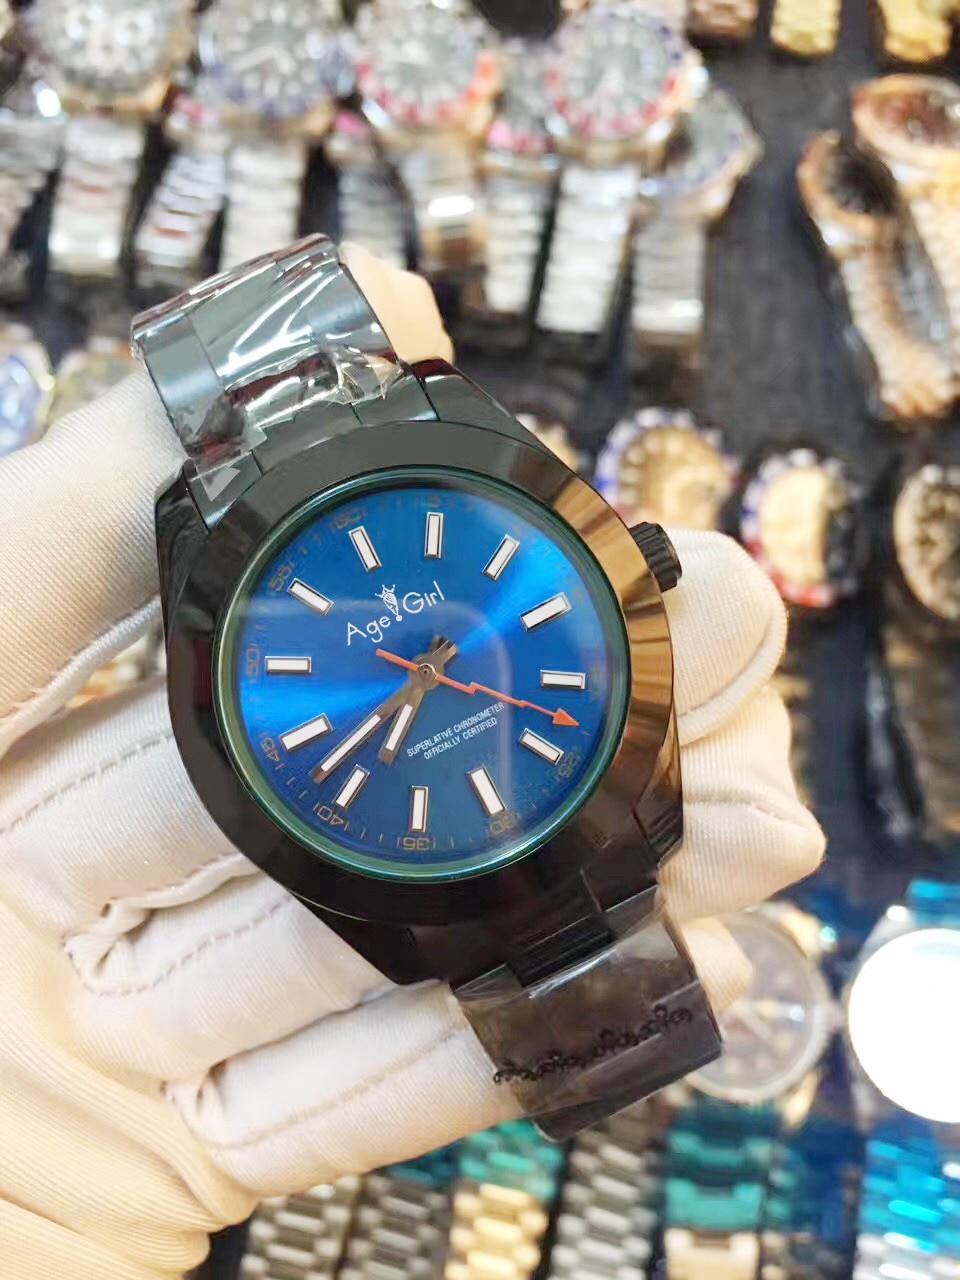 Novo luxo masculino automático mecânico relógios aço inoxidável completo preto prata azul data relógio masculino 41mm aaa +